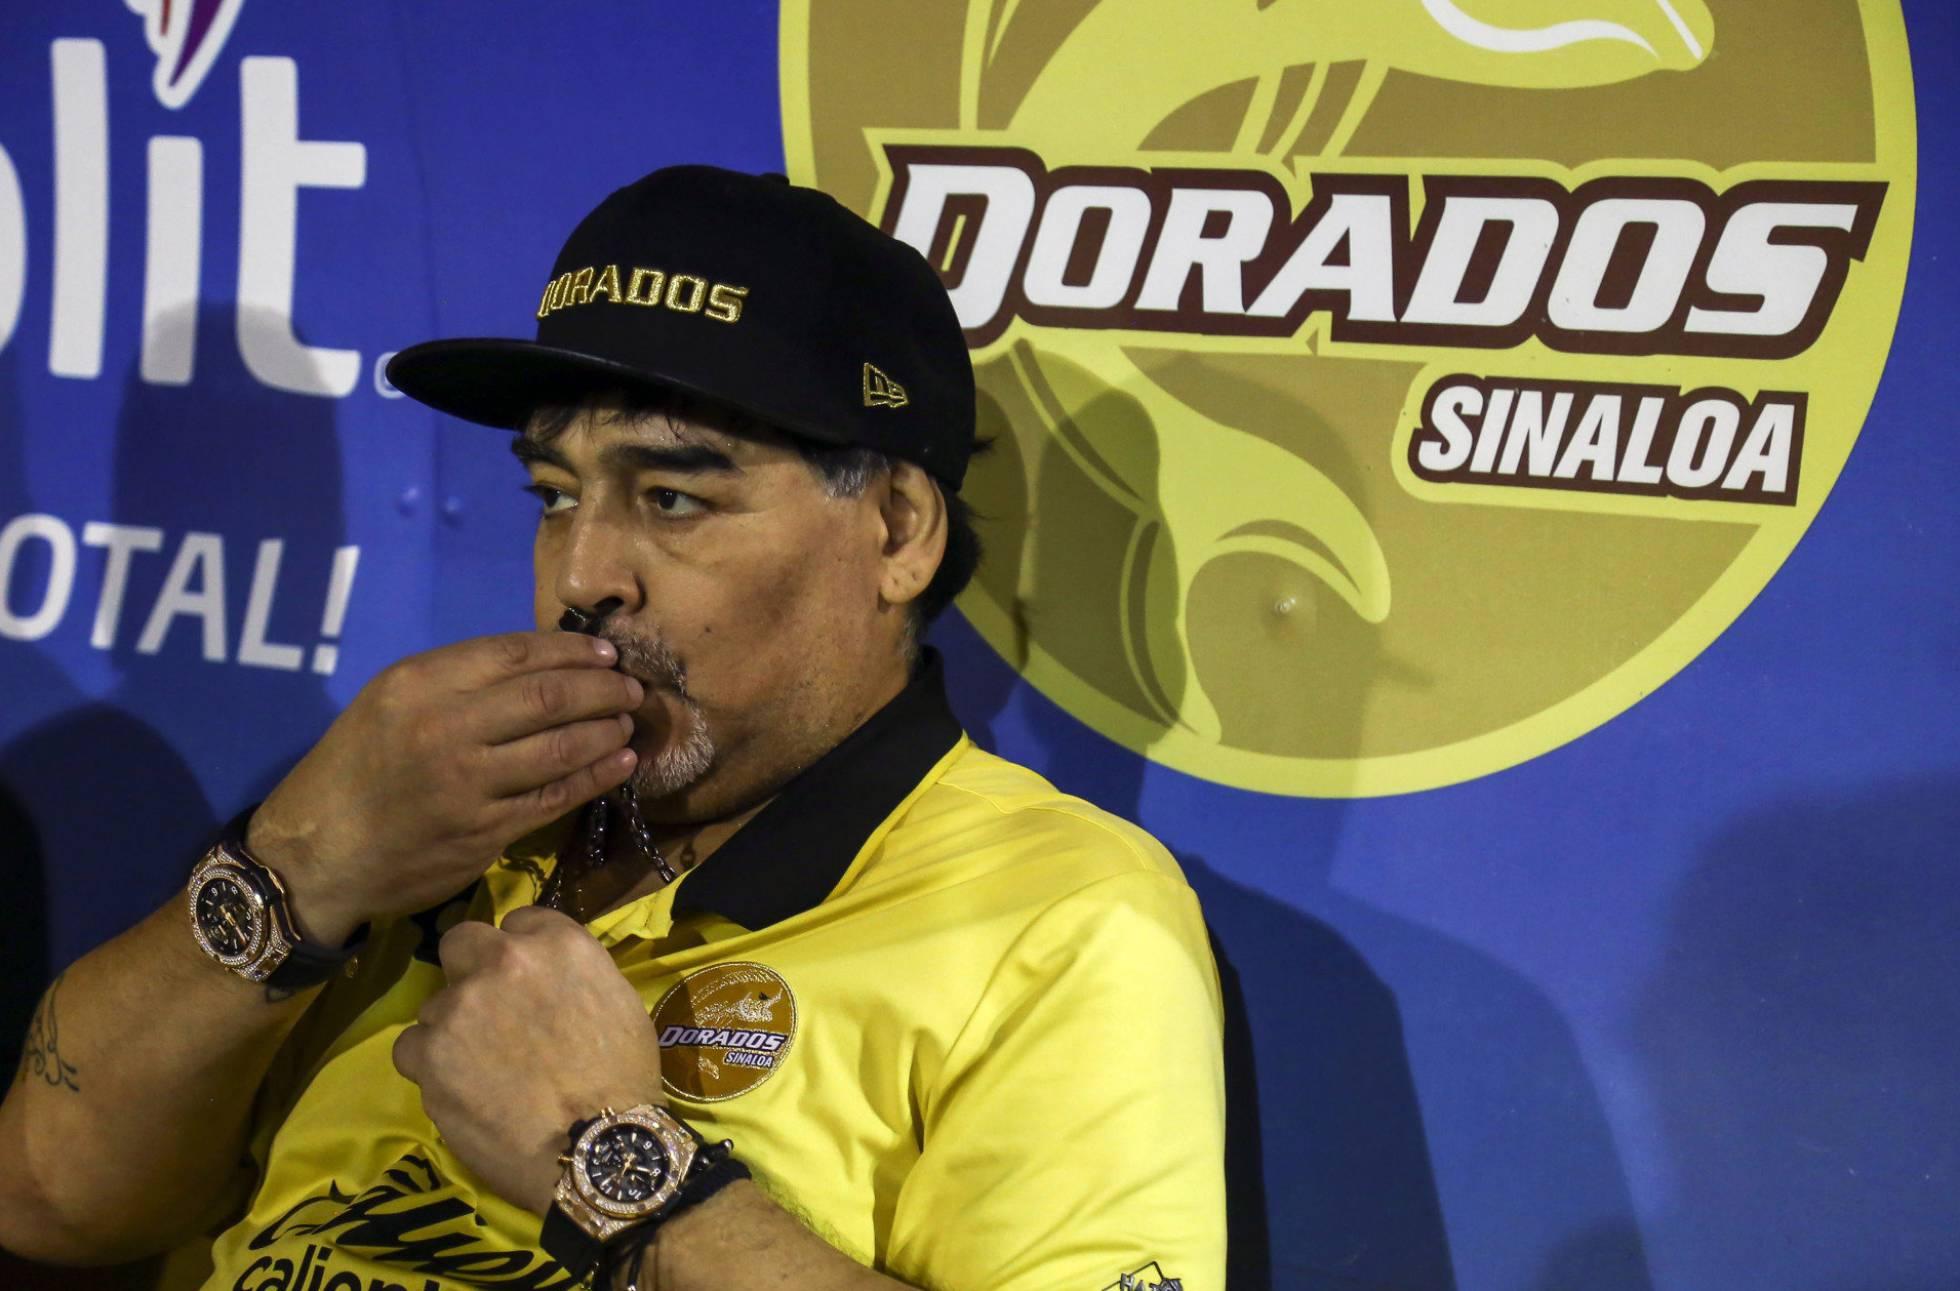 El Atleti mexicano frustra el primer intento de ascenso de Maradona